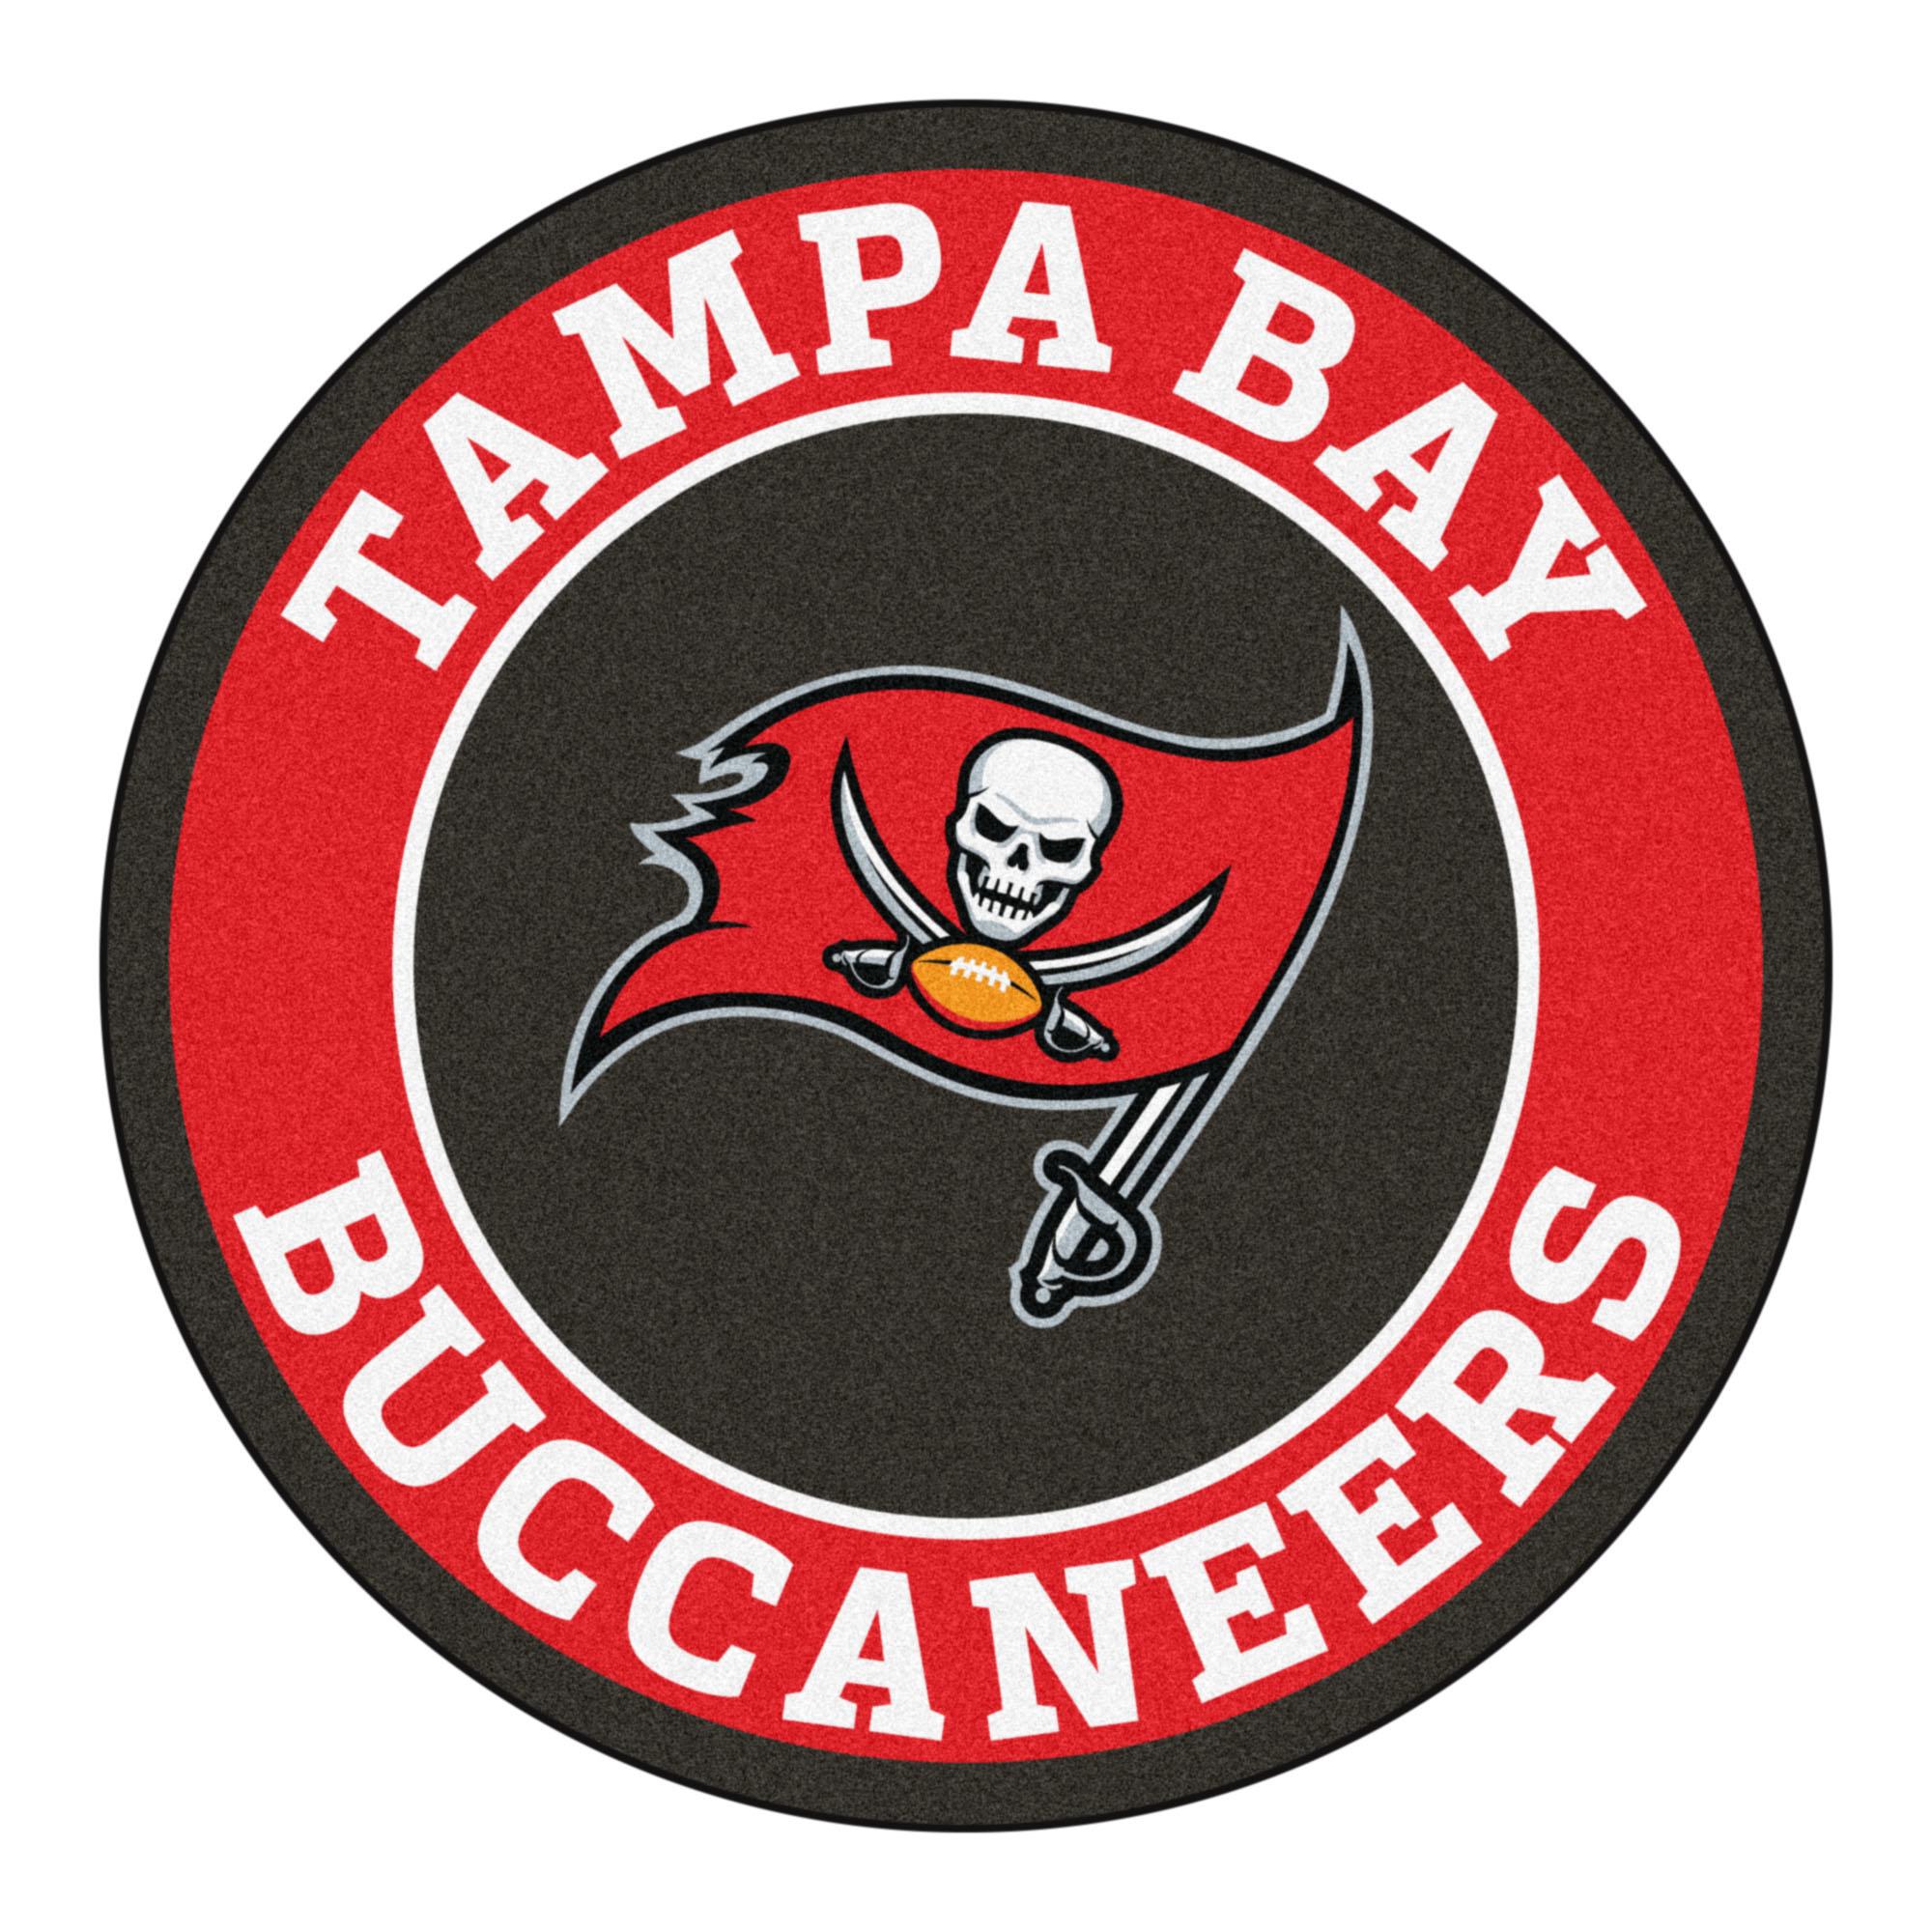 Tm Verified Presale Codes For Tampa Bay Buccaneers